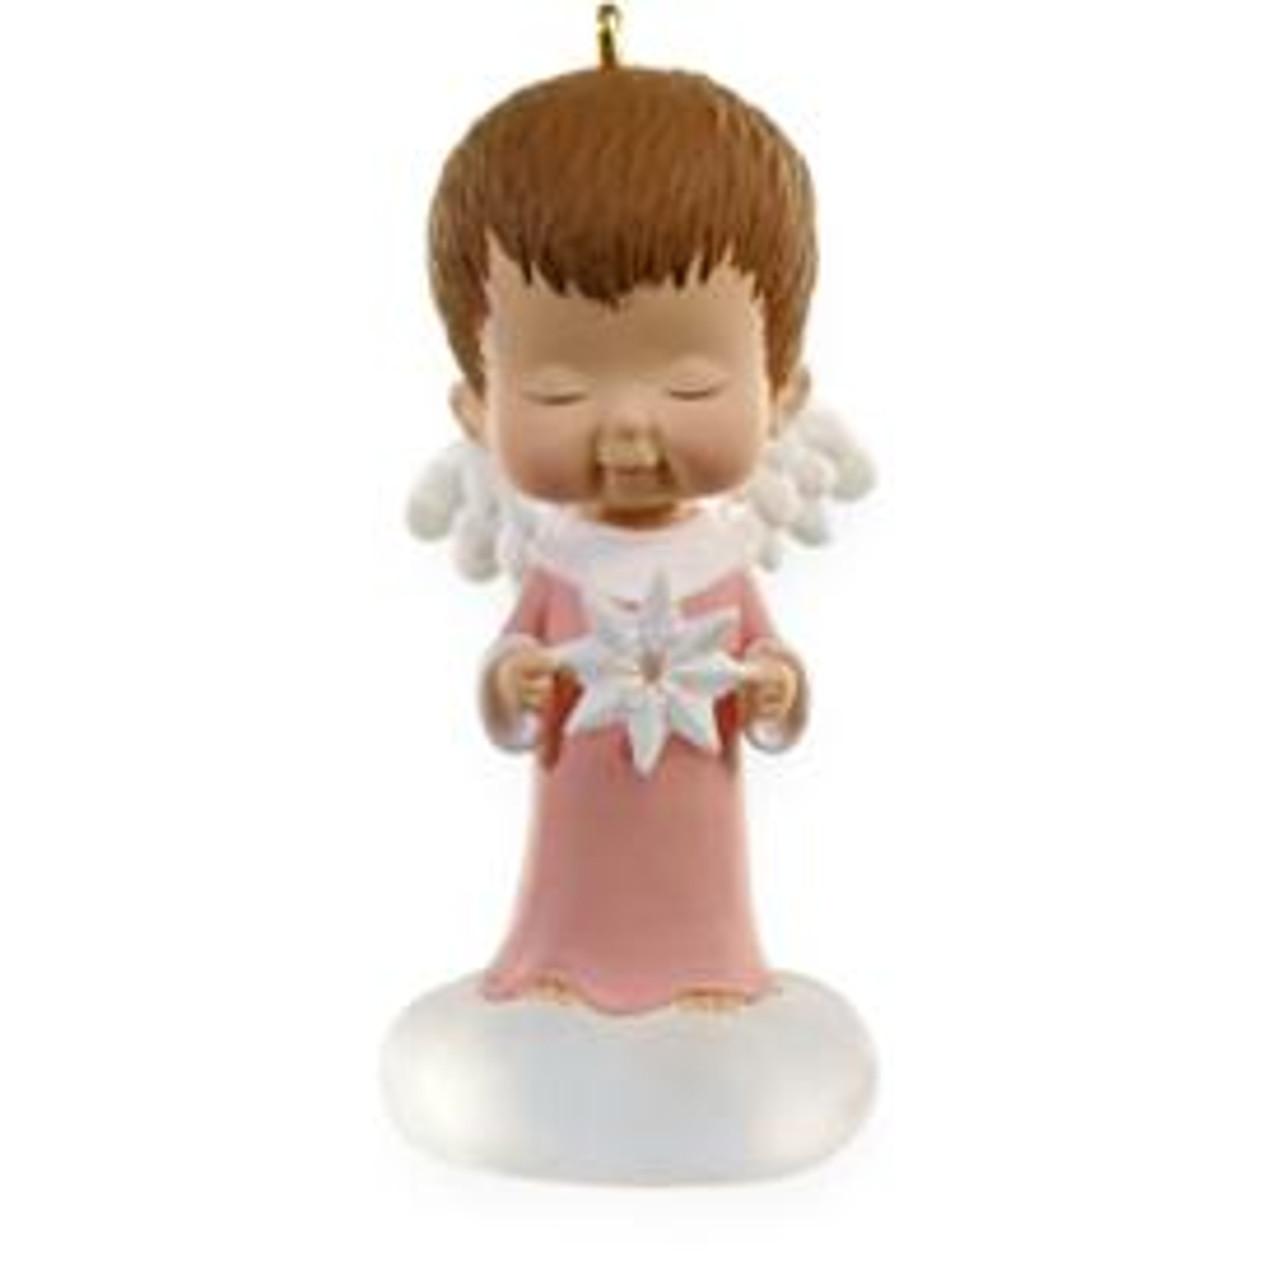 2012 HALLMARK KEEPSAKE CHRISTMAS ORNAMENT STERLING ROSE MARYS ANGELS NEW IN BOX